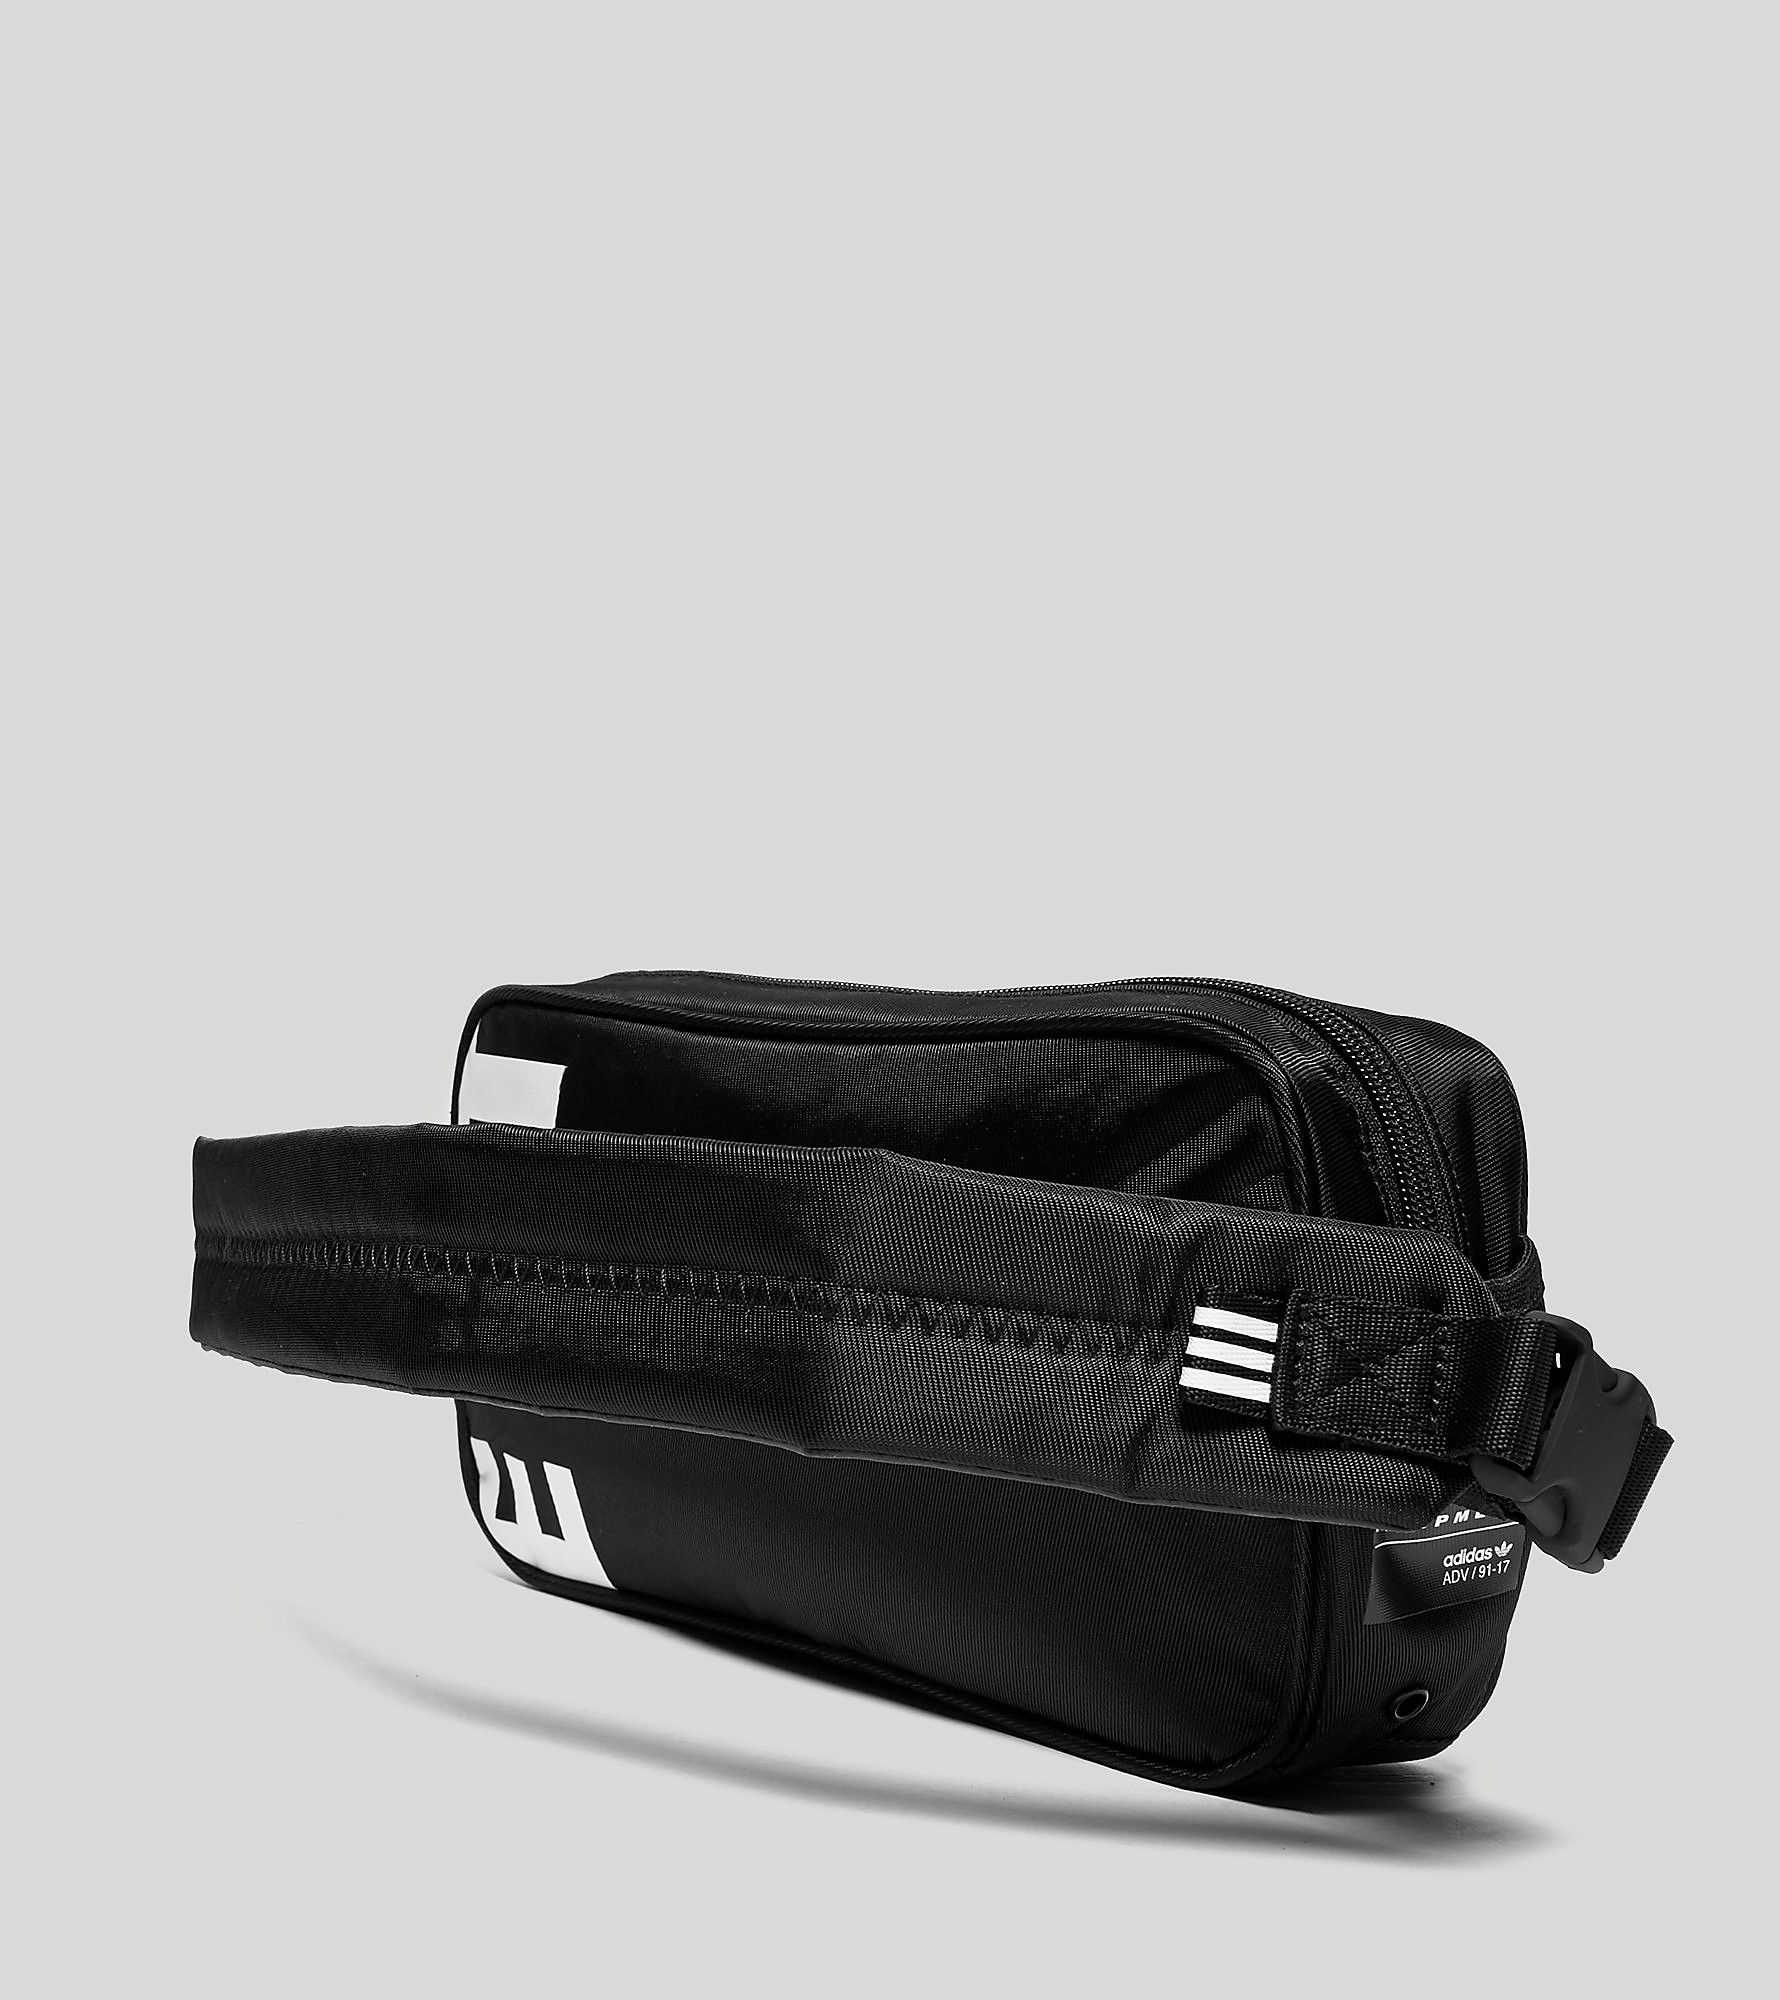 adidas EQT Cross Body Bag